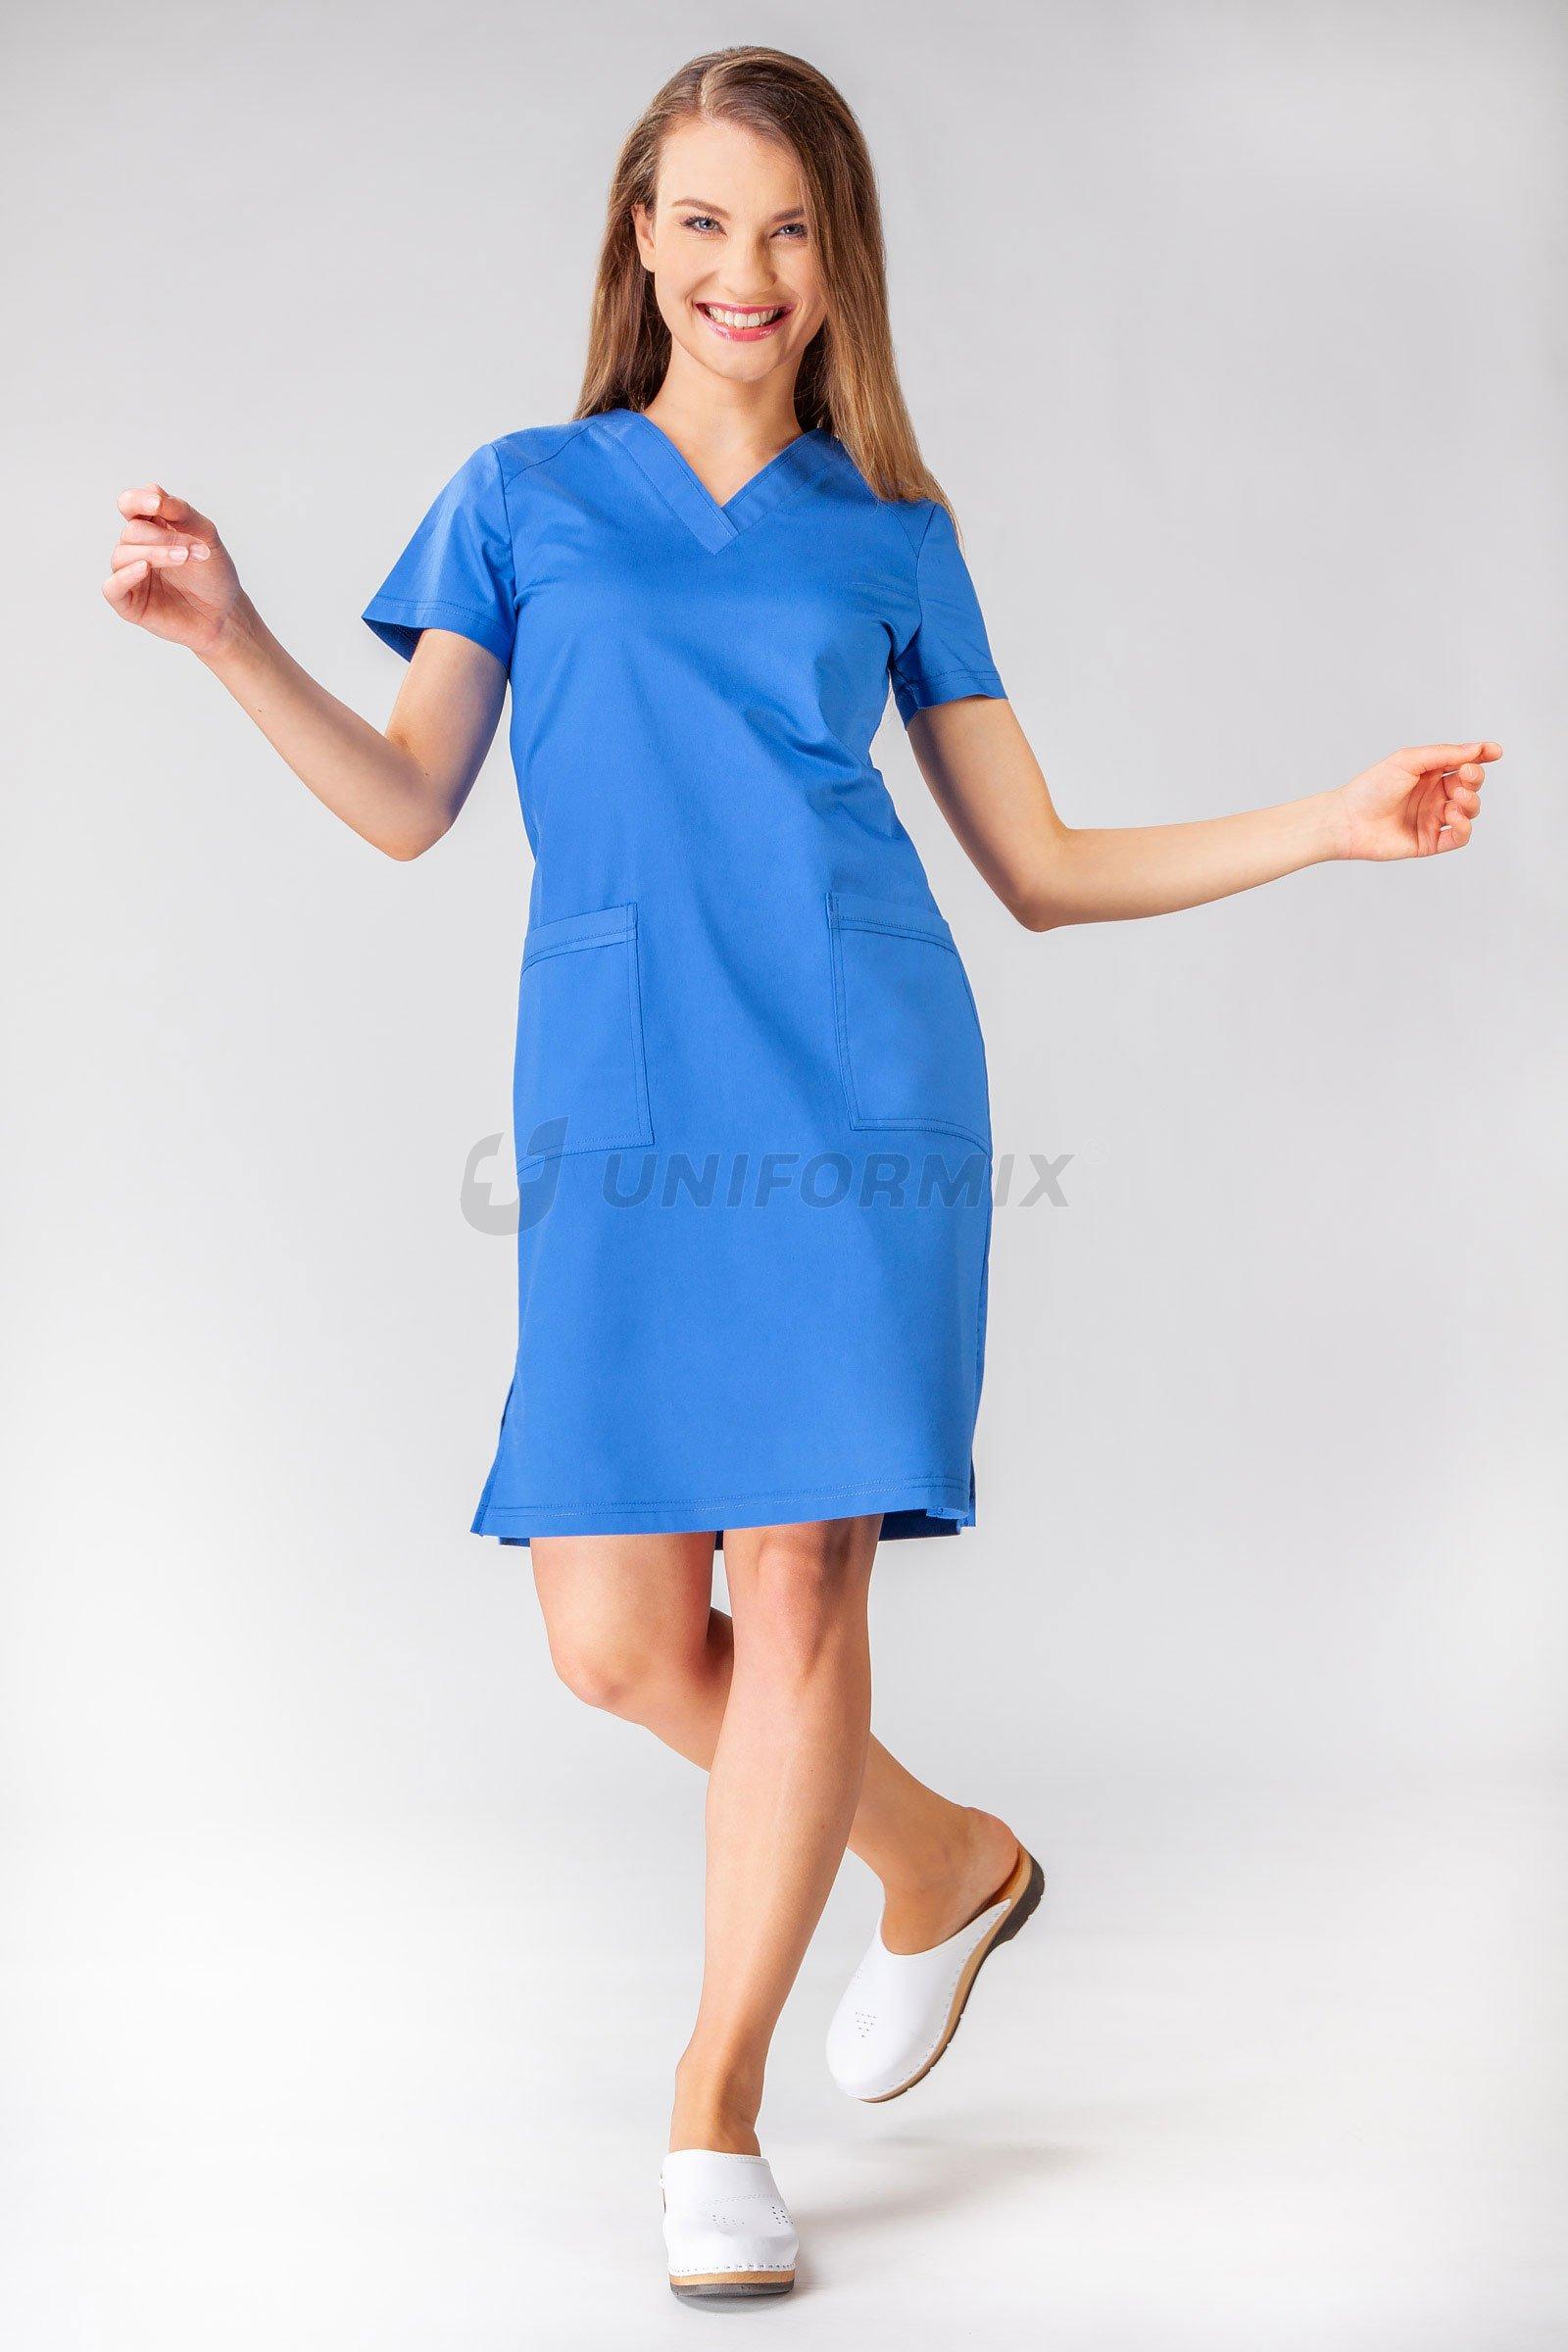 medizinisches kleid, flexzone fz2052, dunkelblau.